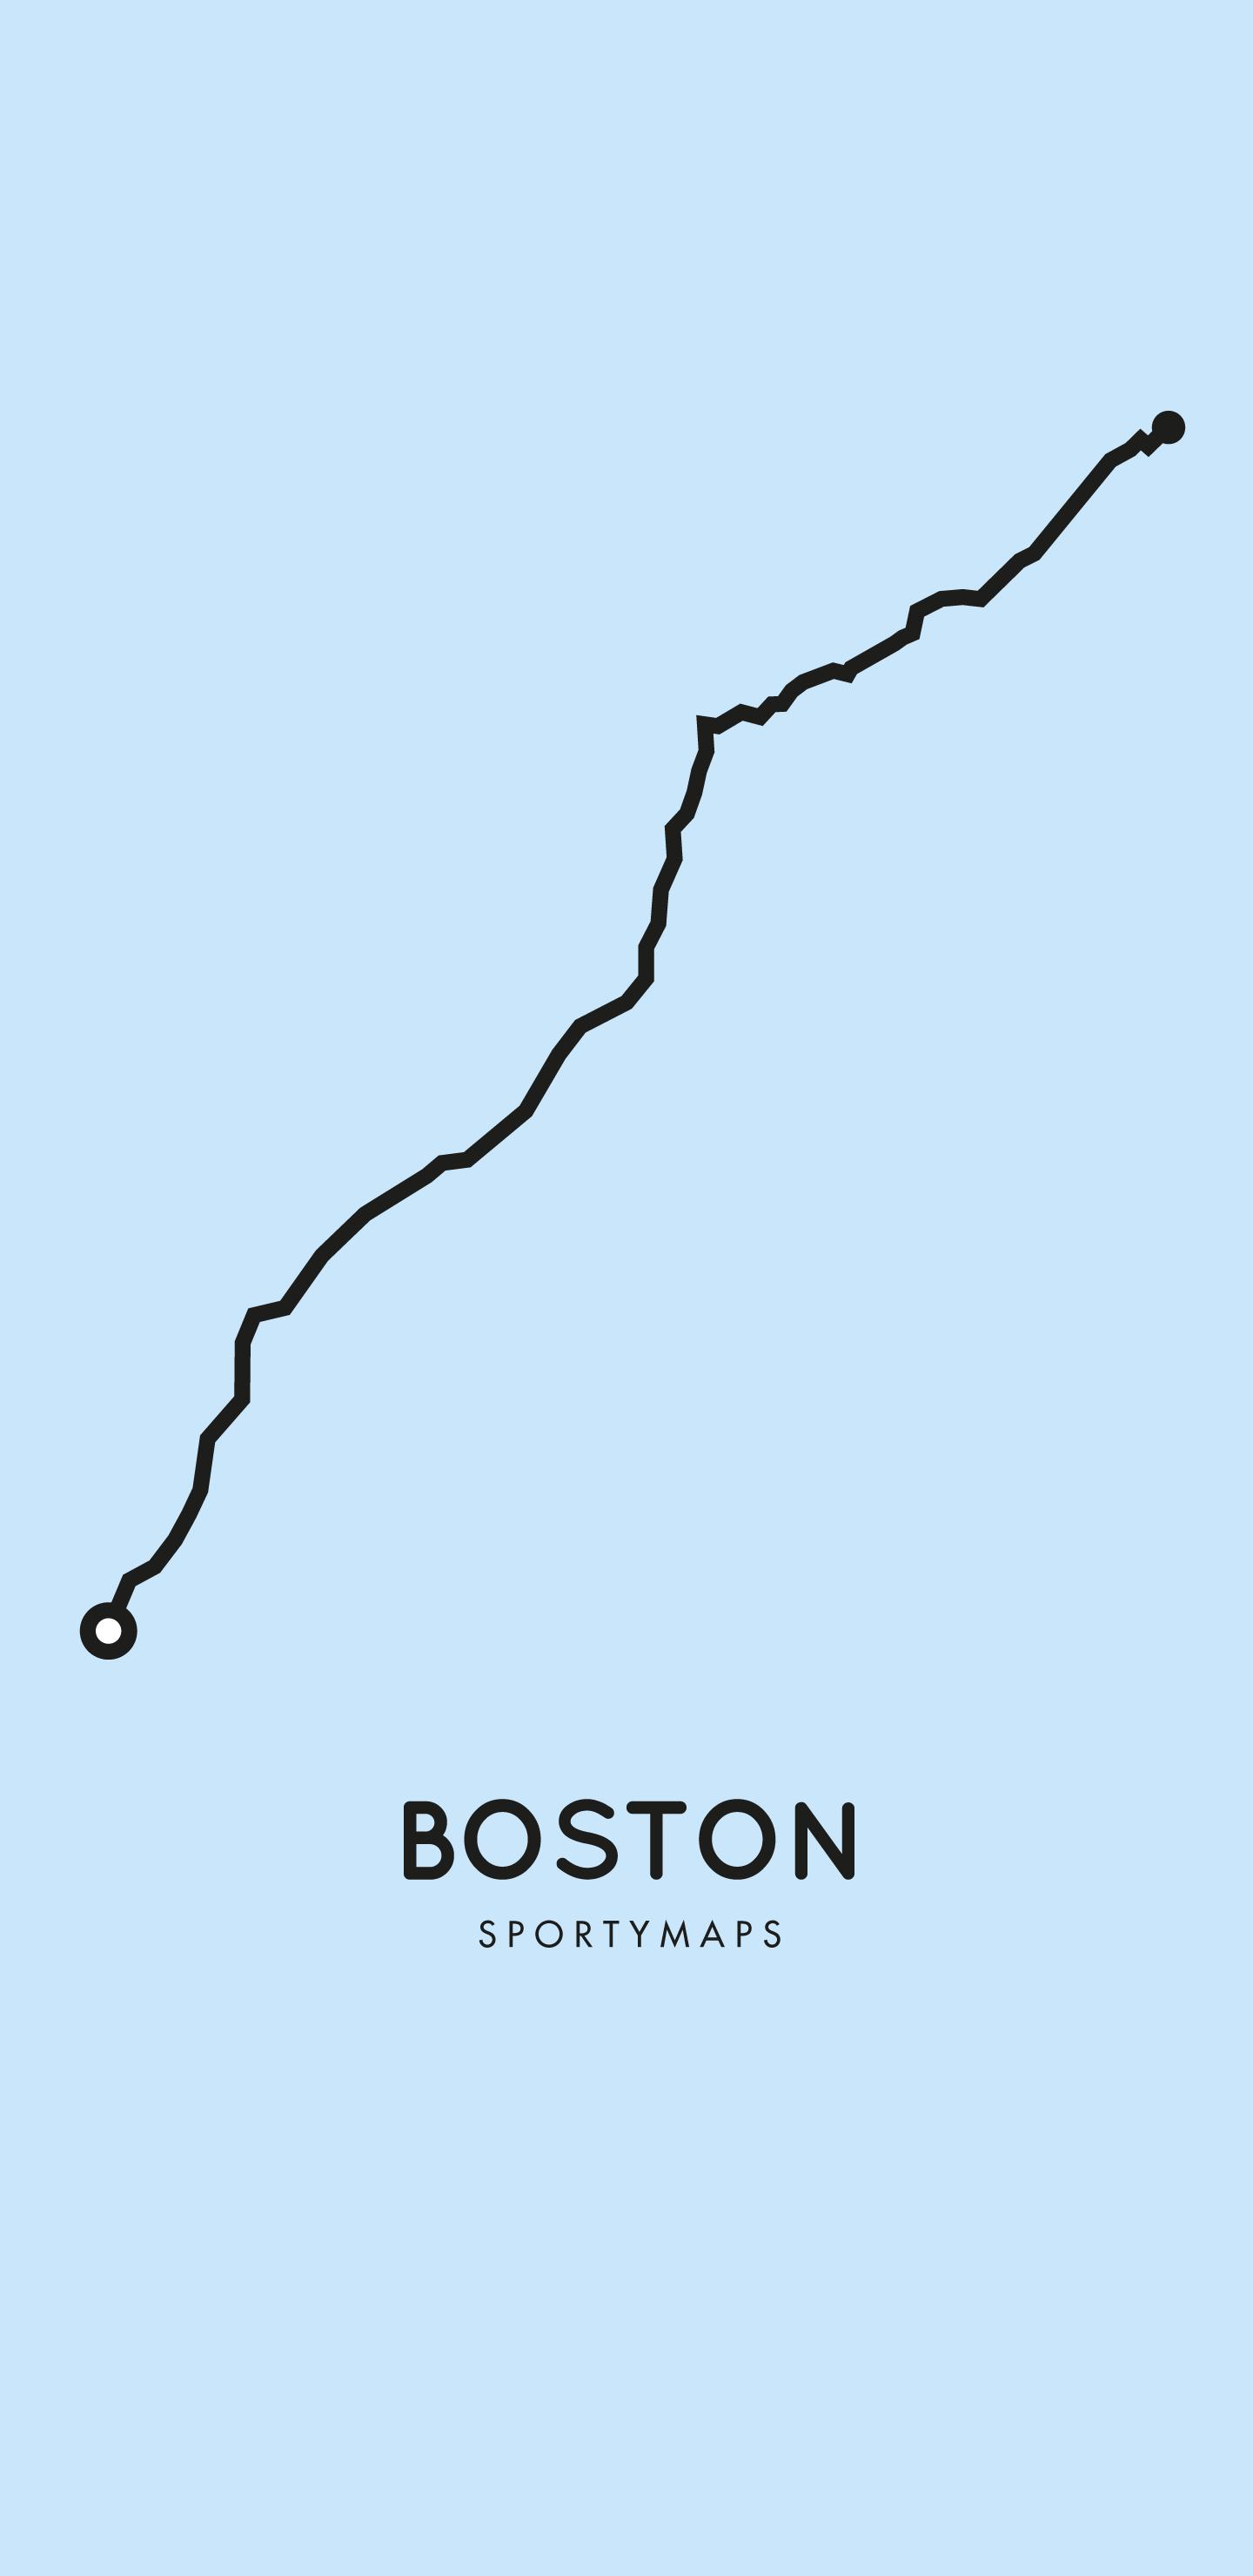 Sportymaps-Boston-marathon-blue